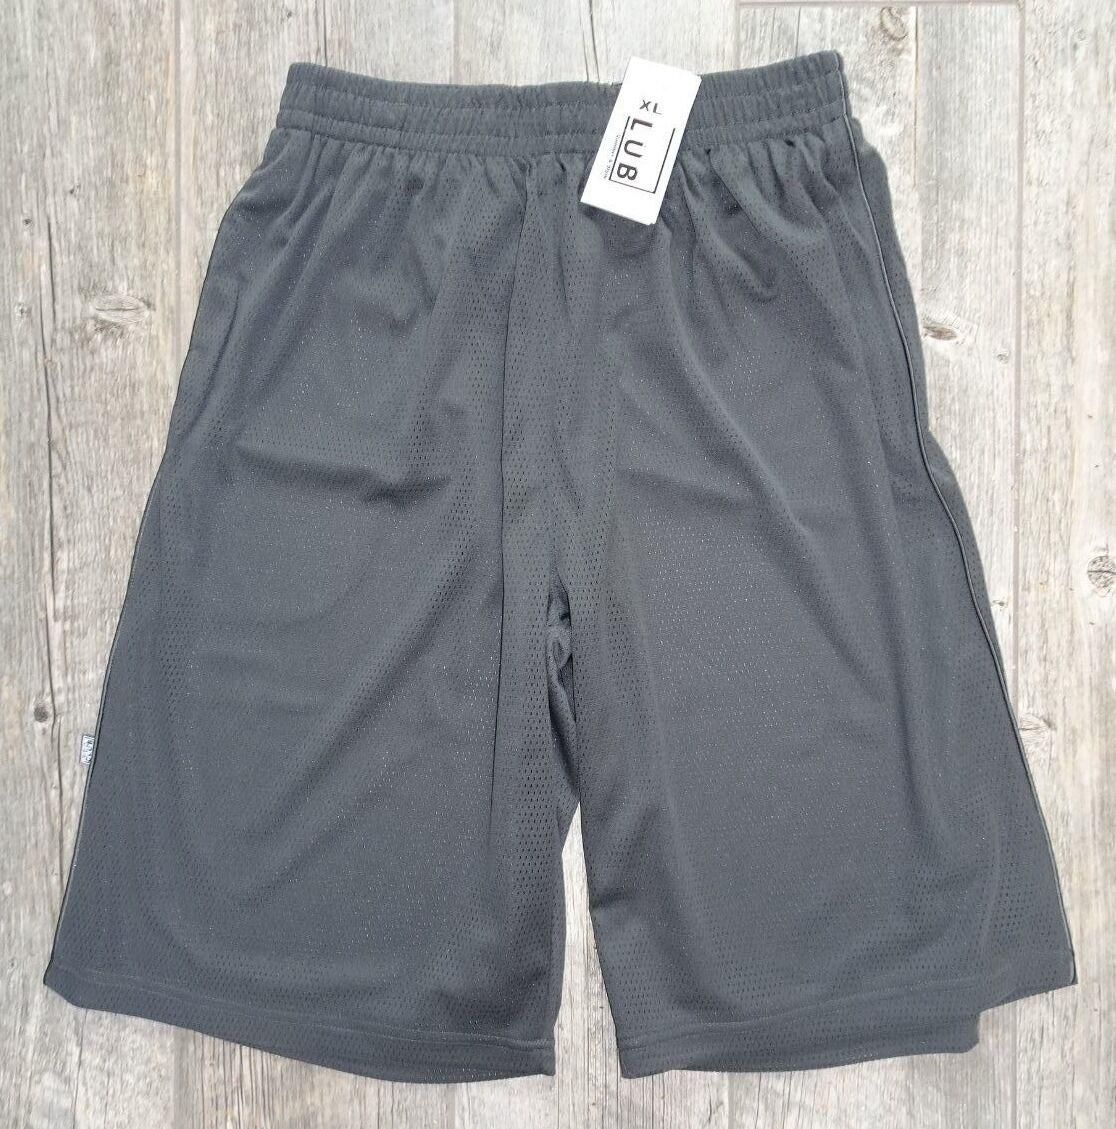 New Pro Club Mesh Shorts w/ Pocket - Charcoal Gray - L, XL,